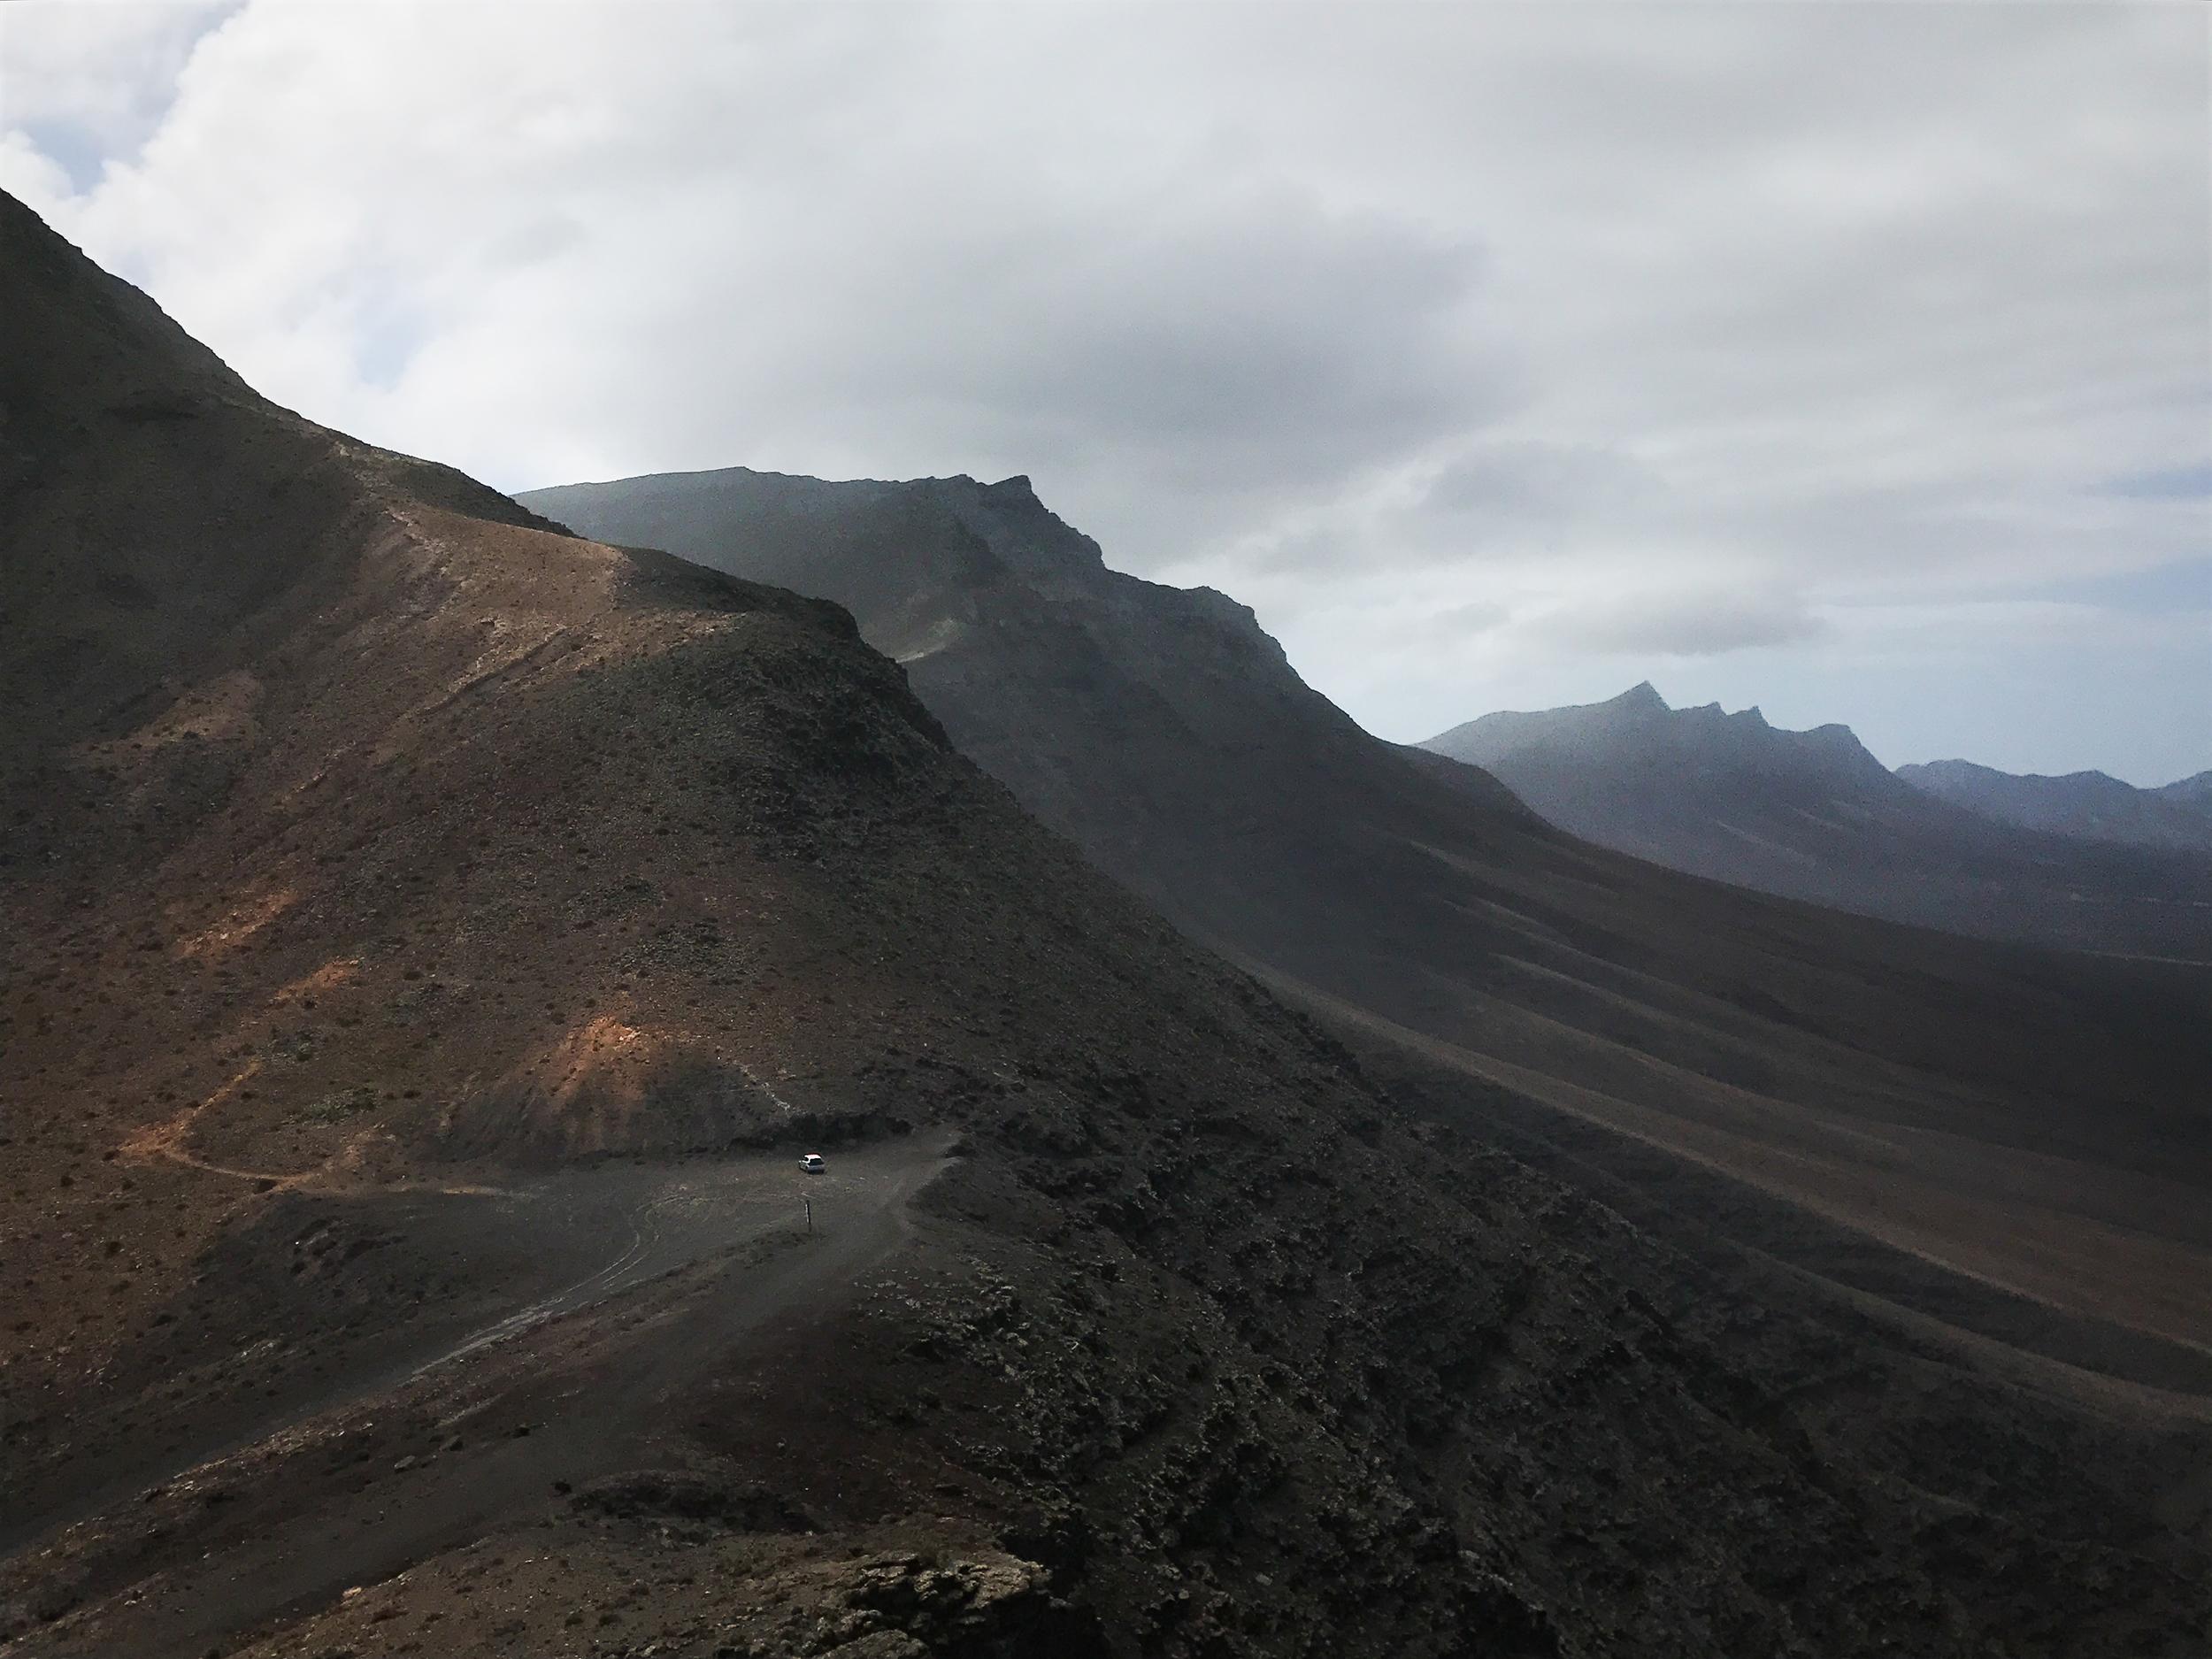 Parque Natural Jandia, Fuerteventura, Canary Islands